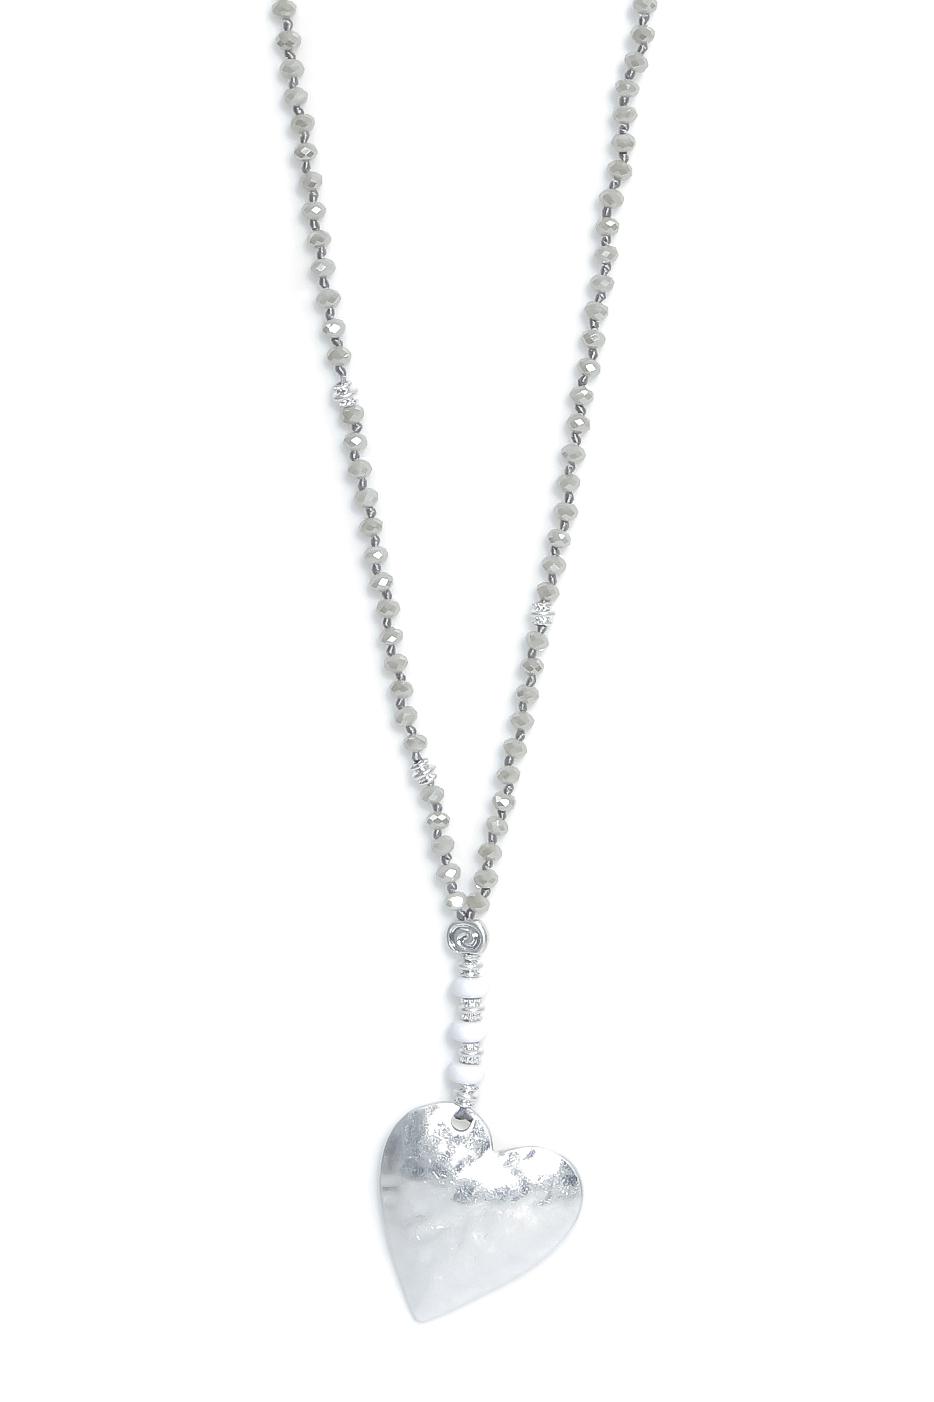 1444 ENVY Heart Necklace